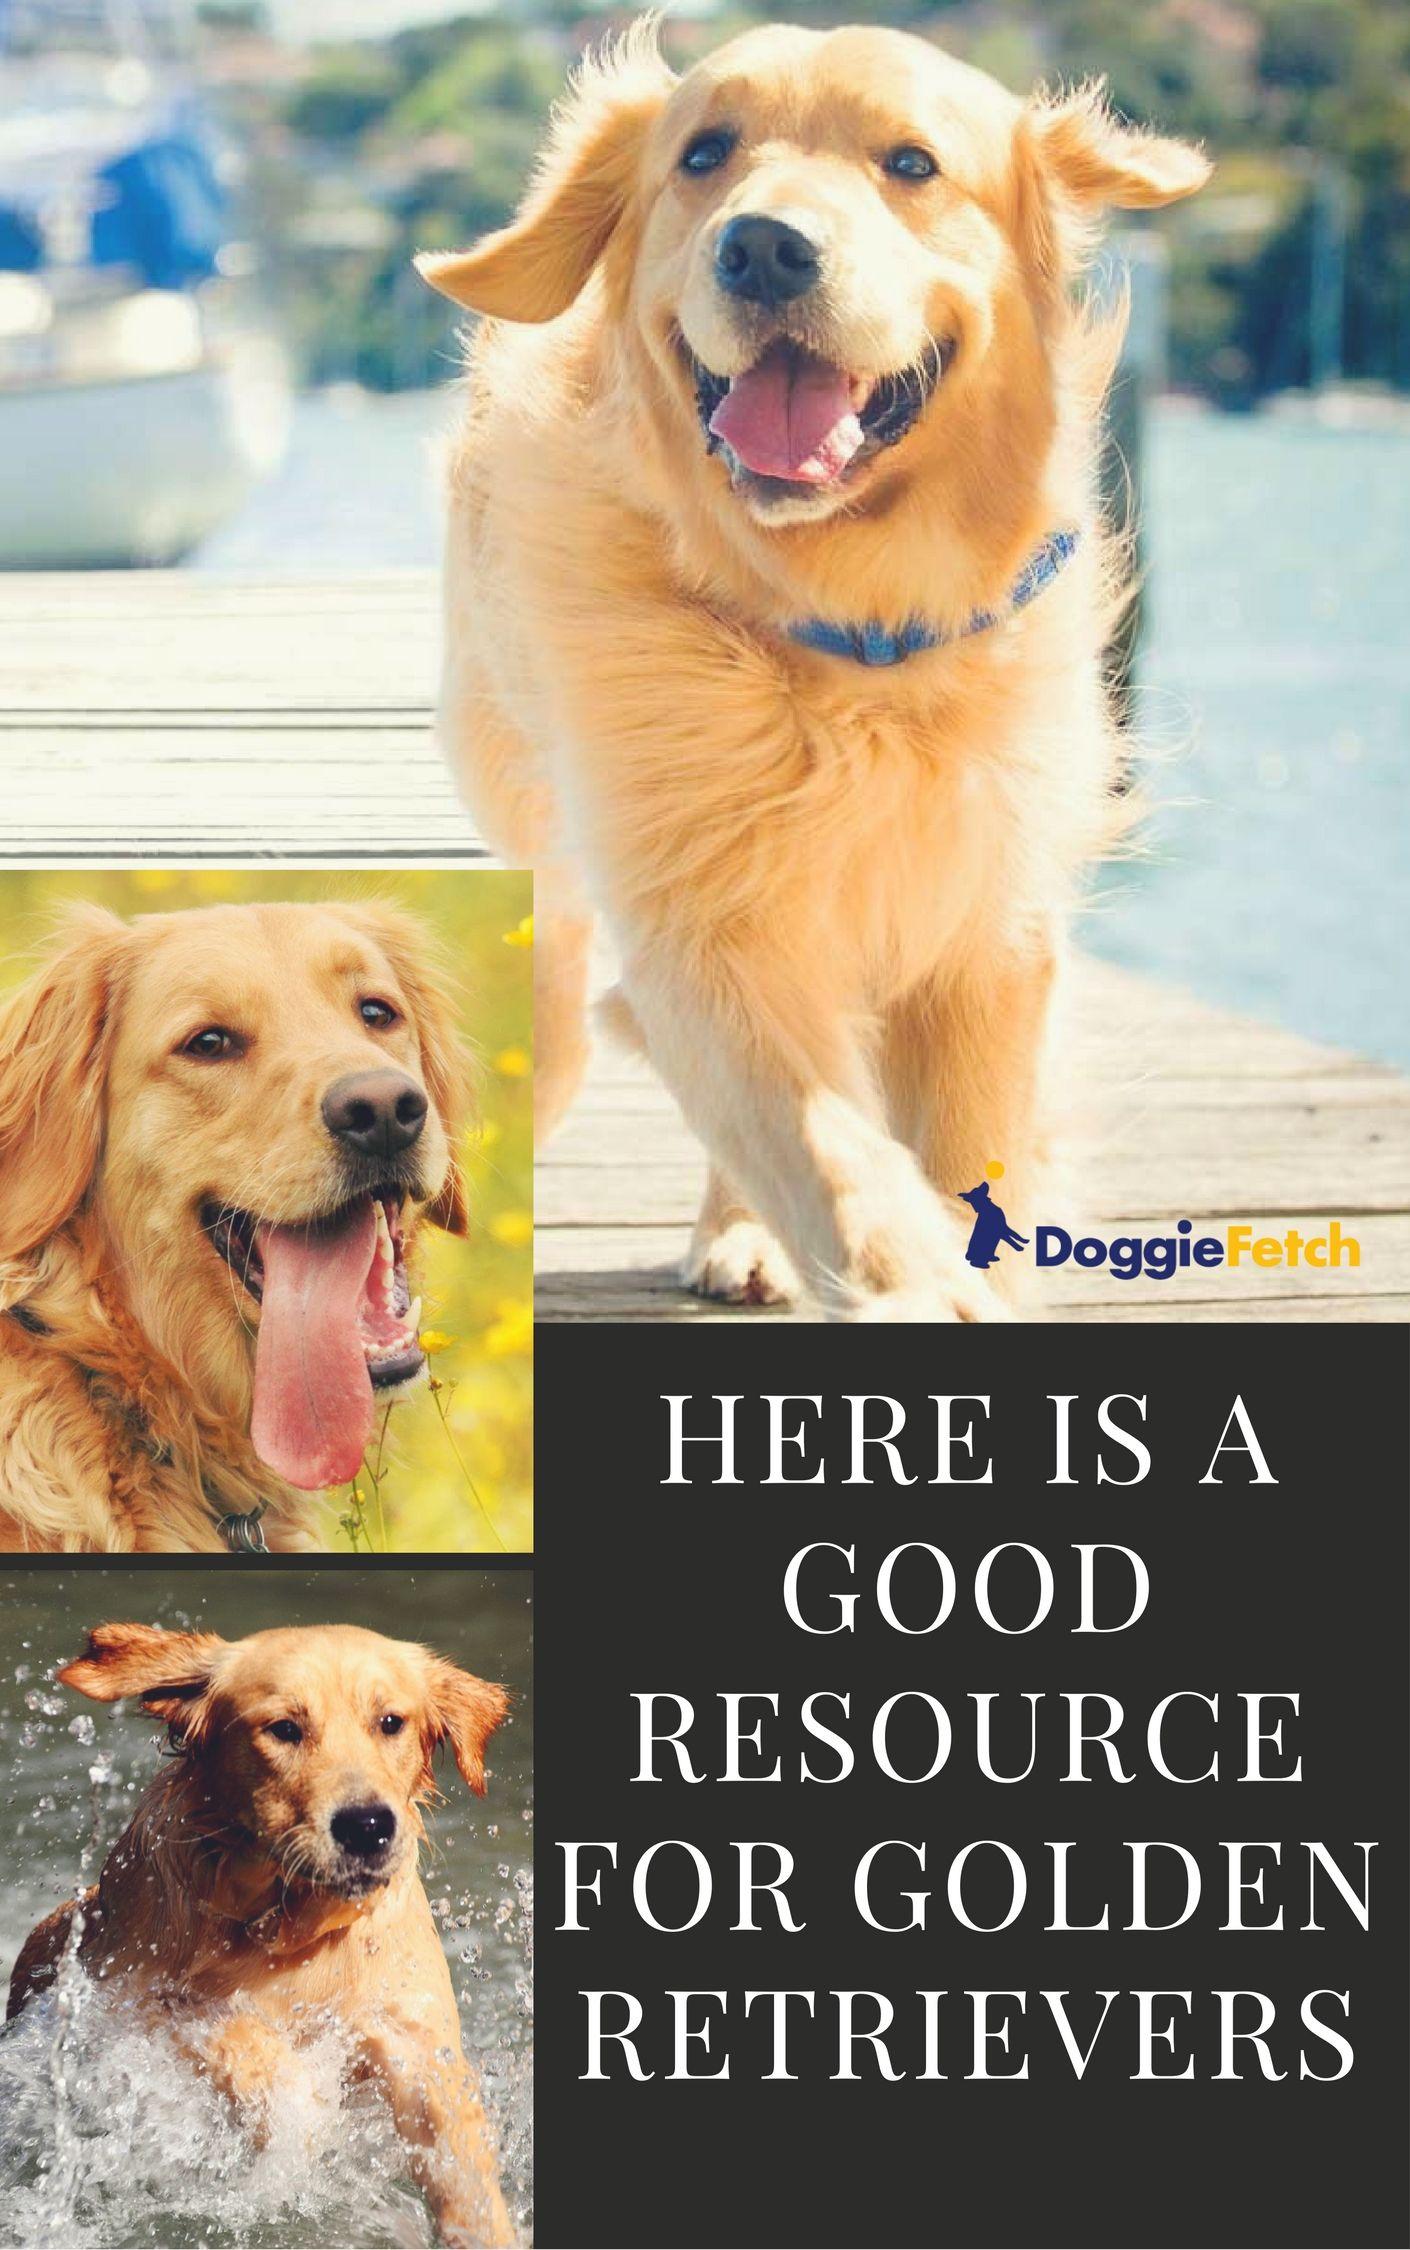 5 Best Frisbee Dog Breeds Of 2018 Dogs Golden Retriever Dogs